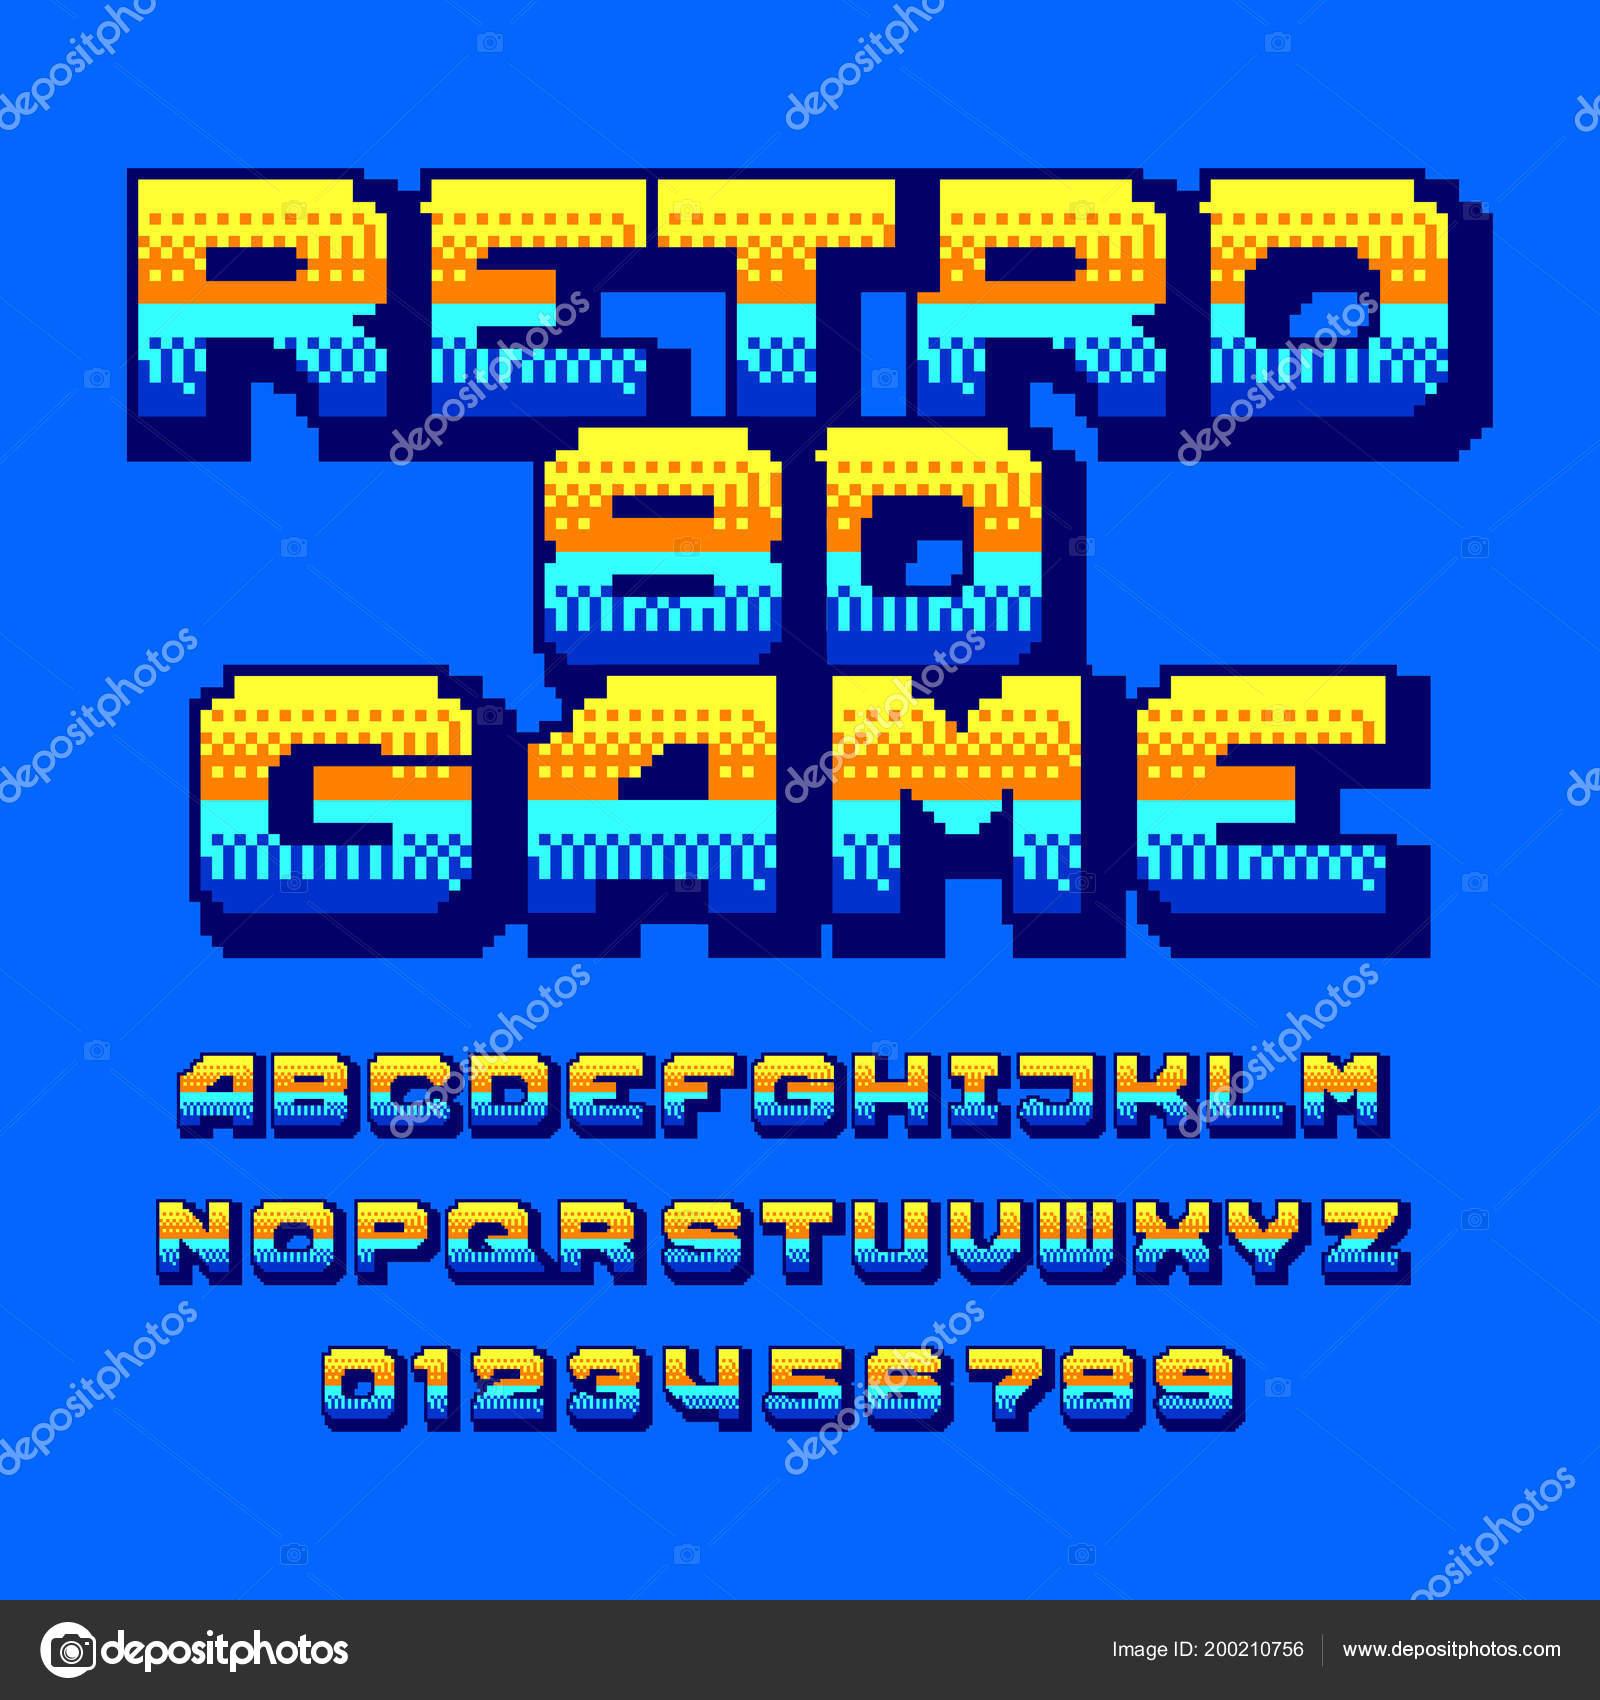 Retro Computer Game Alphabet Font Colorful Pixel Gradient Letters Numbers Stock Vector C Epifantsev 200210756